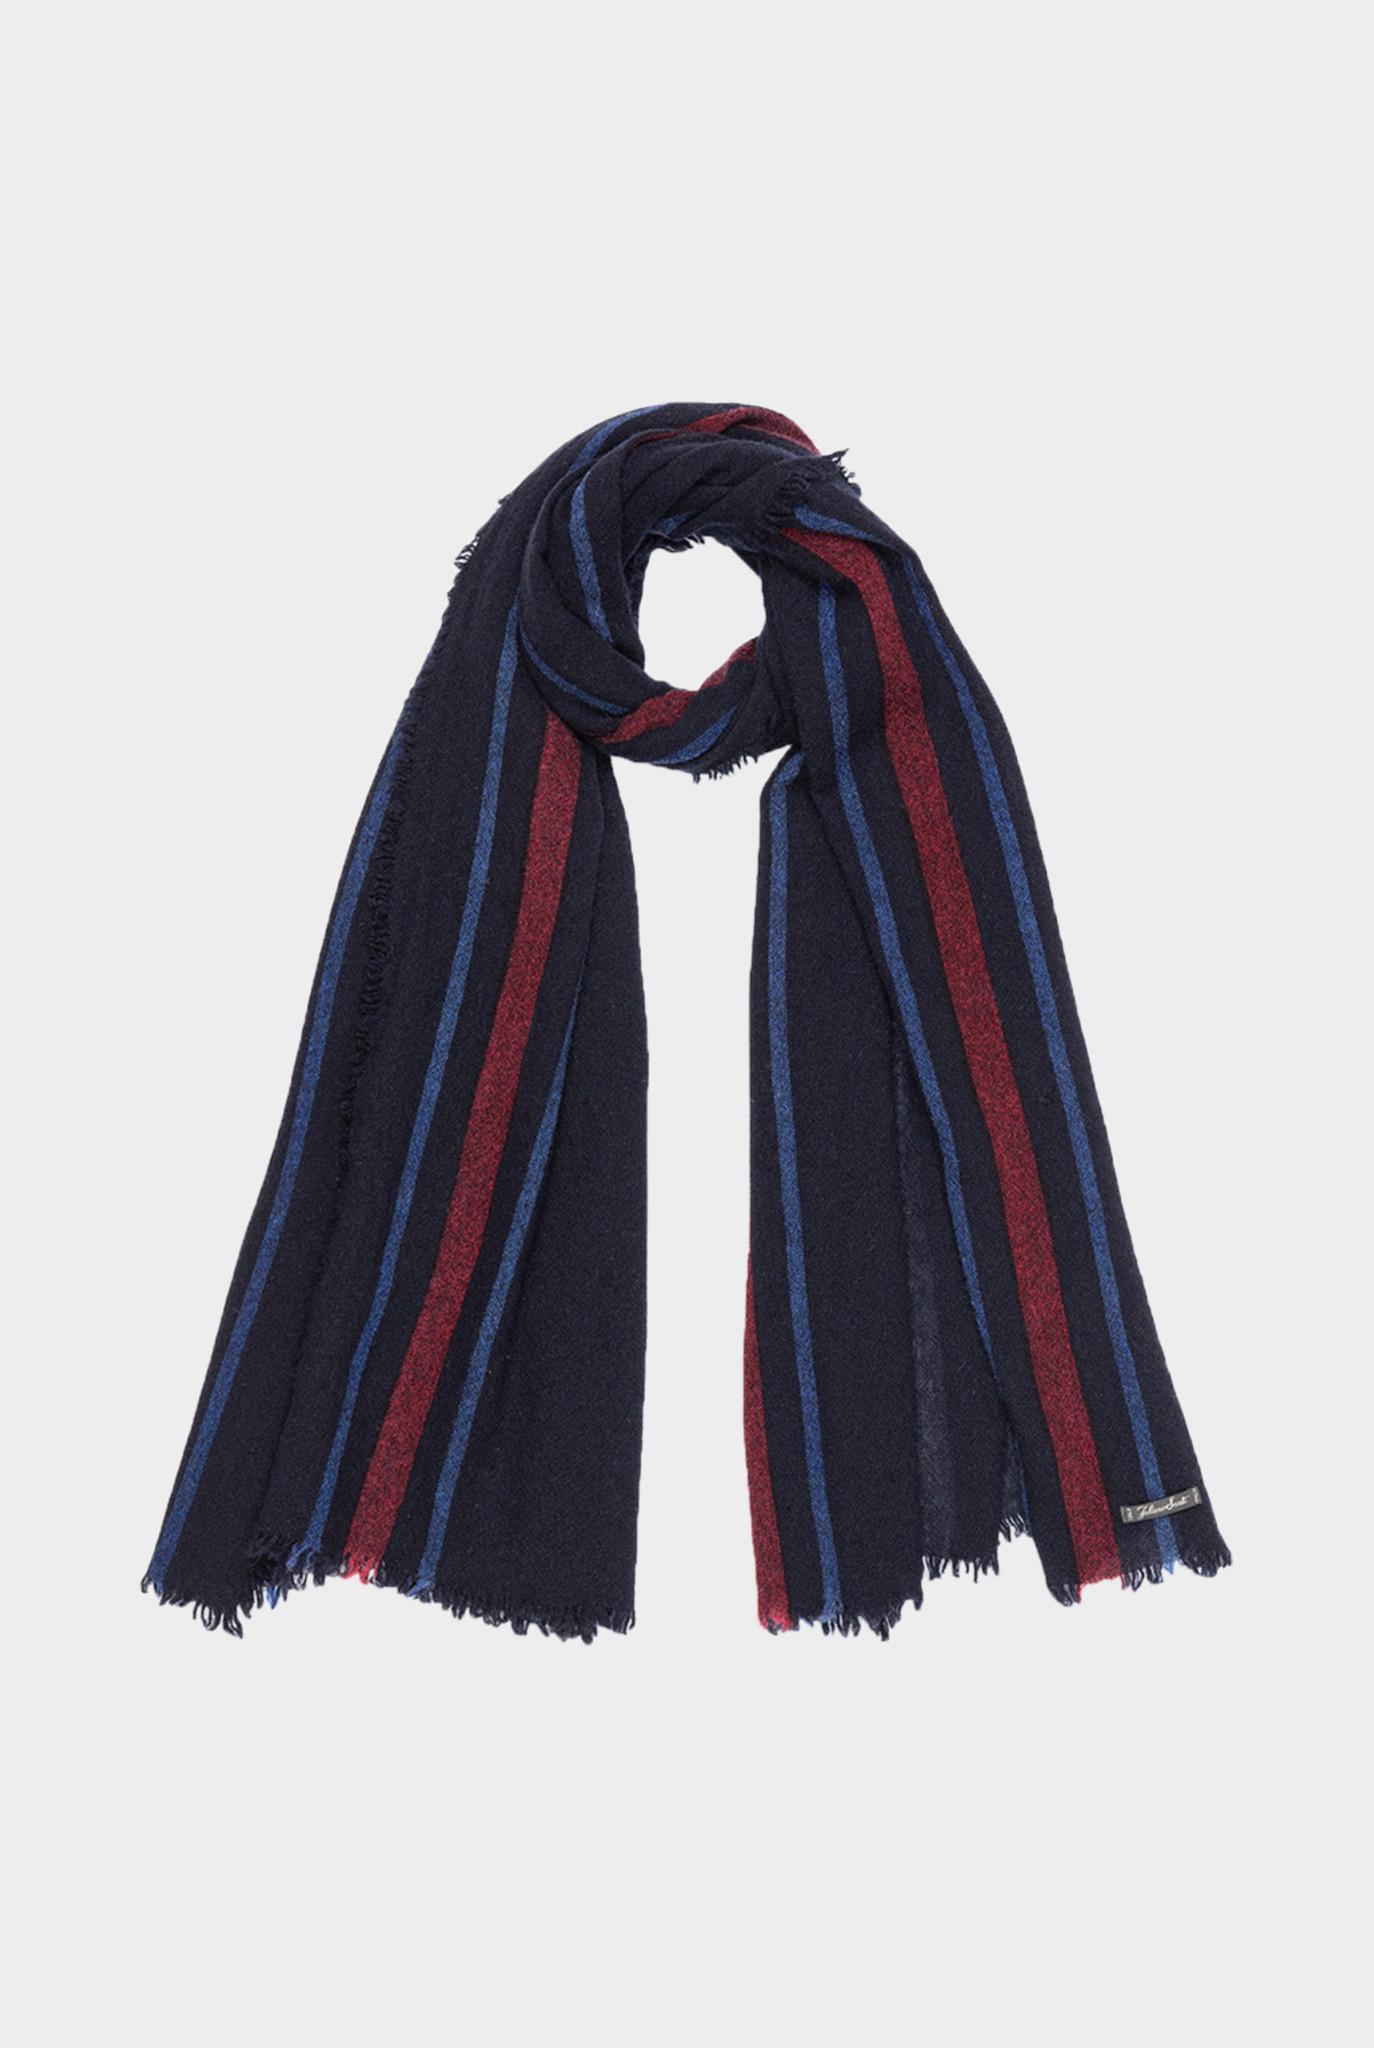 Roller Scarf Dark Blue Red Stripes